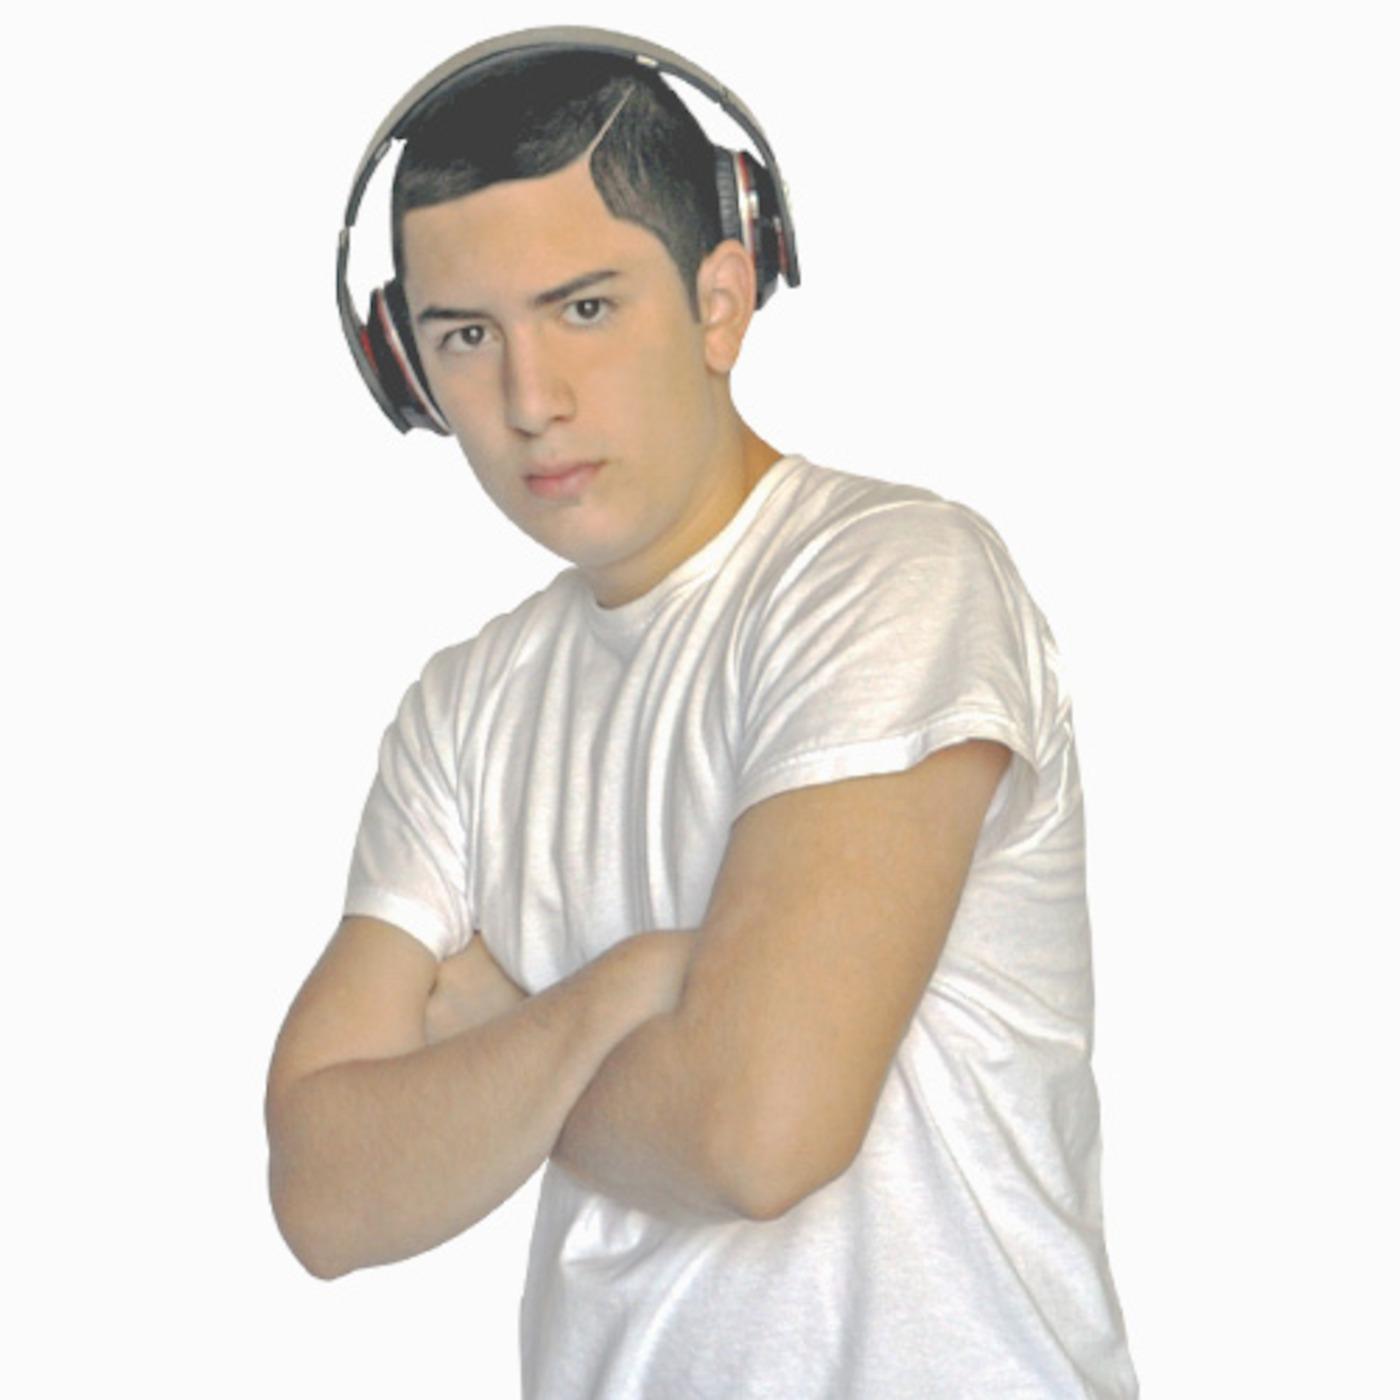 DJ ELECTRONOIZE - BIG ROOM HOUSE - ELECTRO HOUSE - PROGRESSIVE - TRANCE